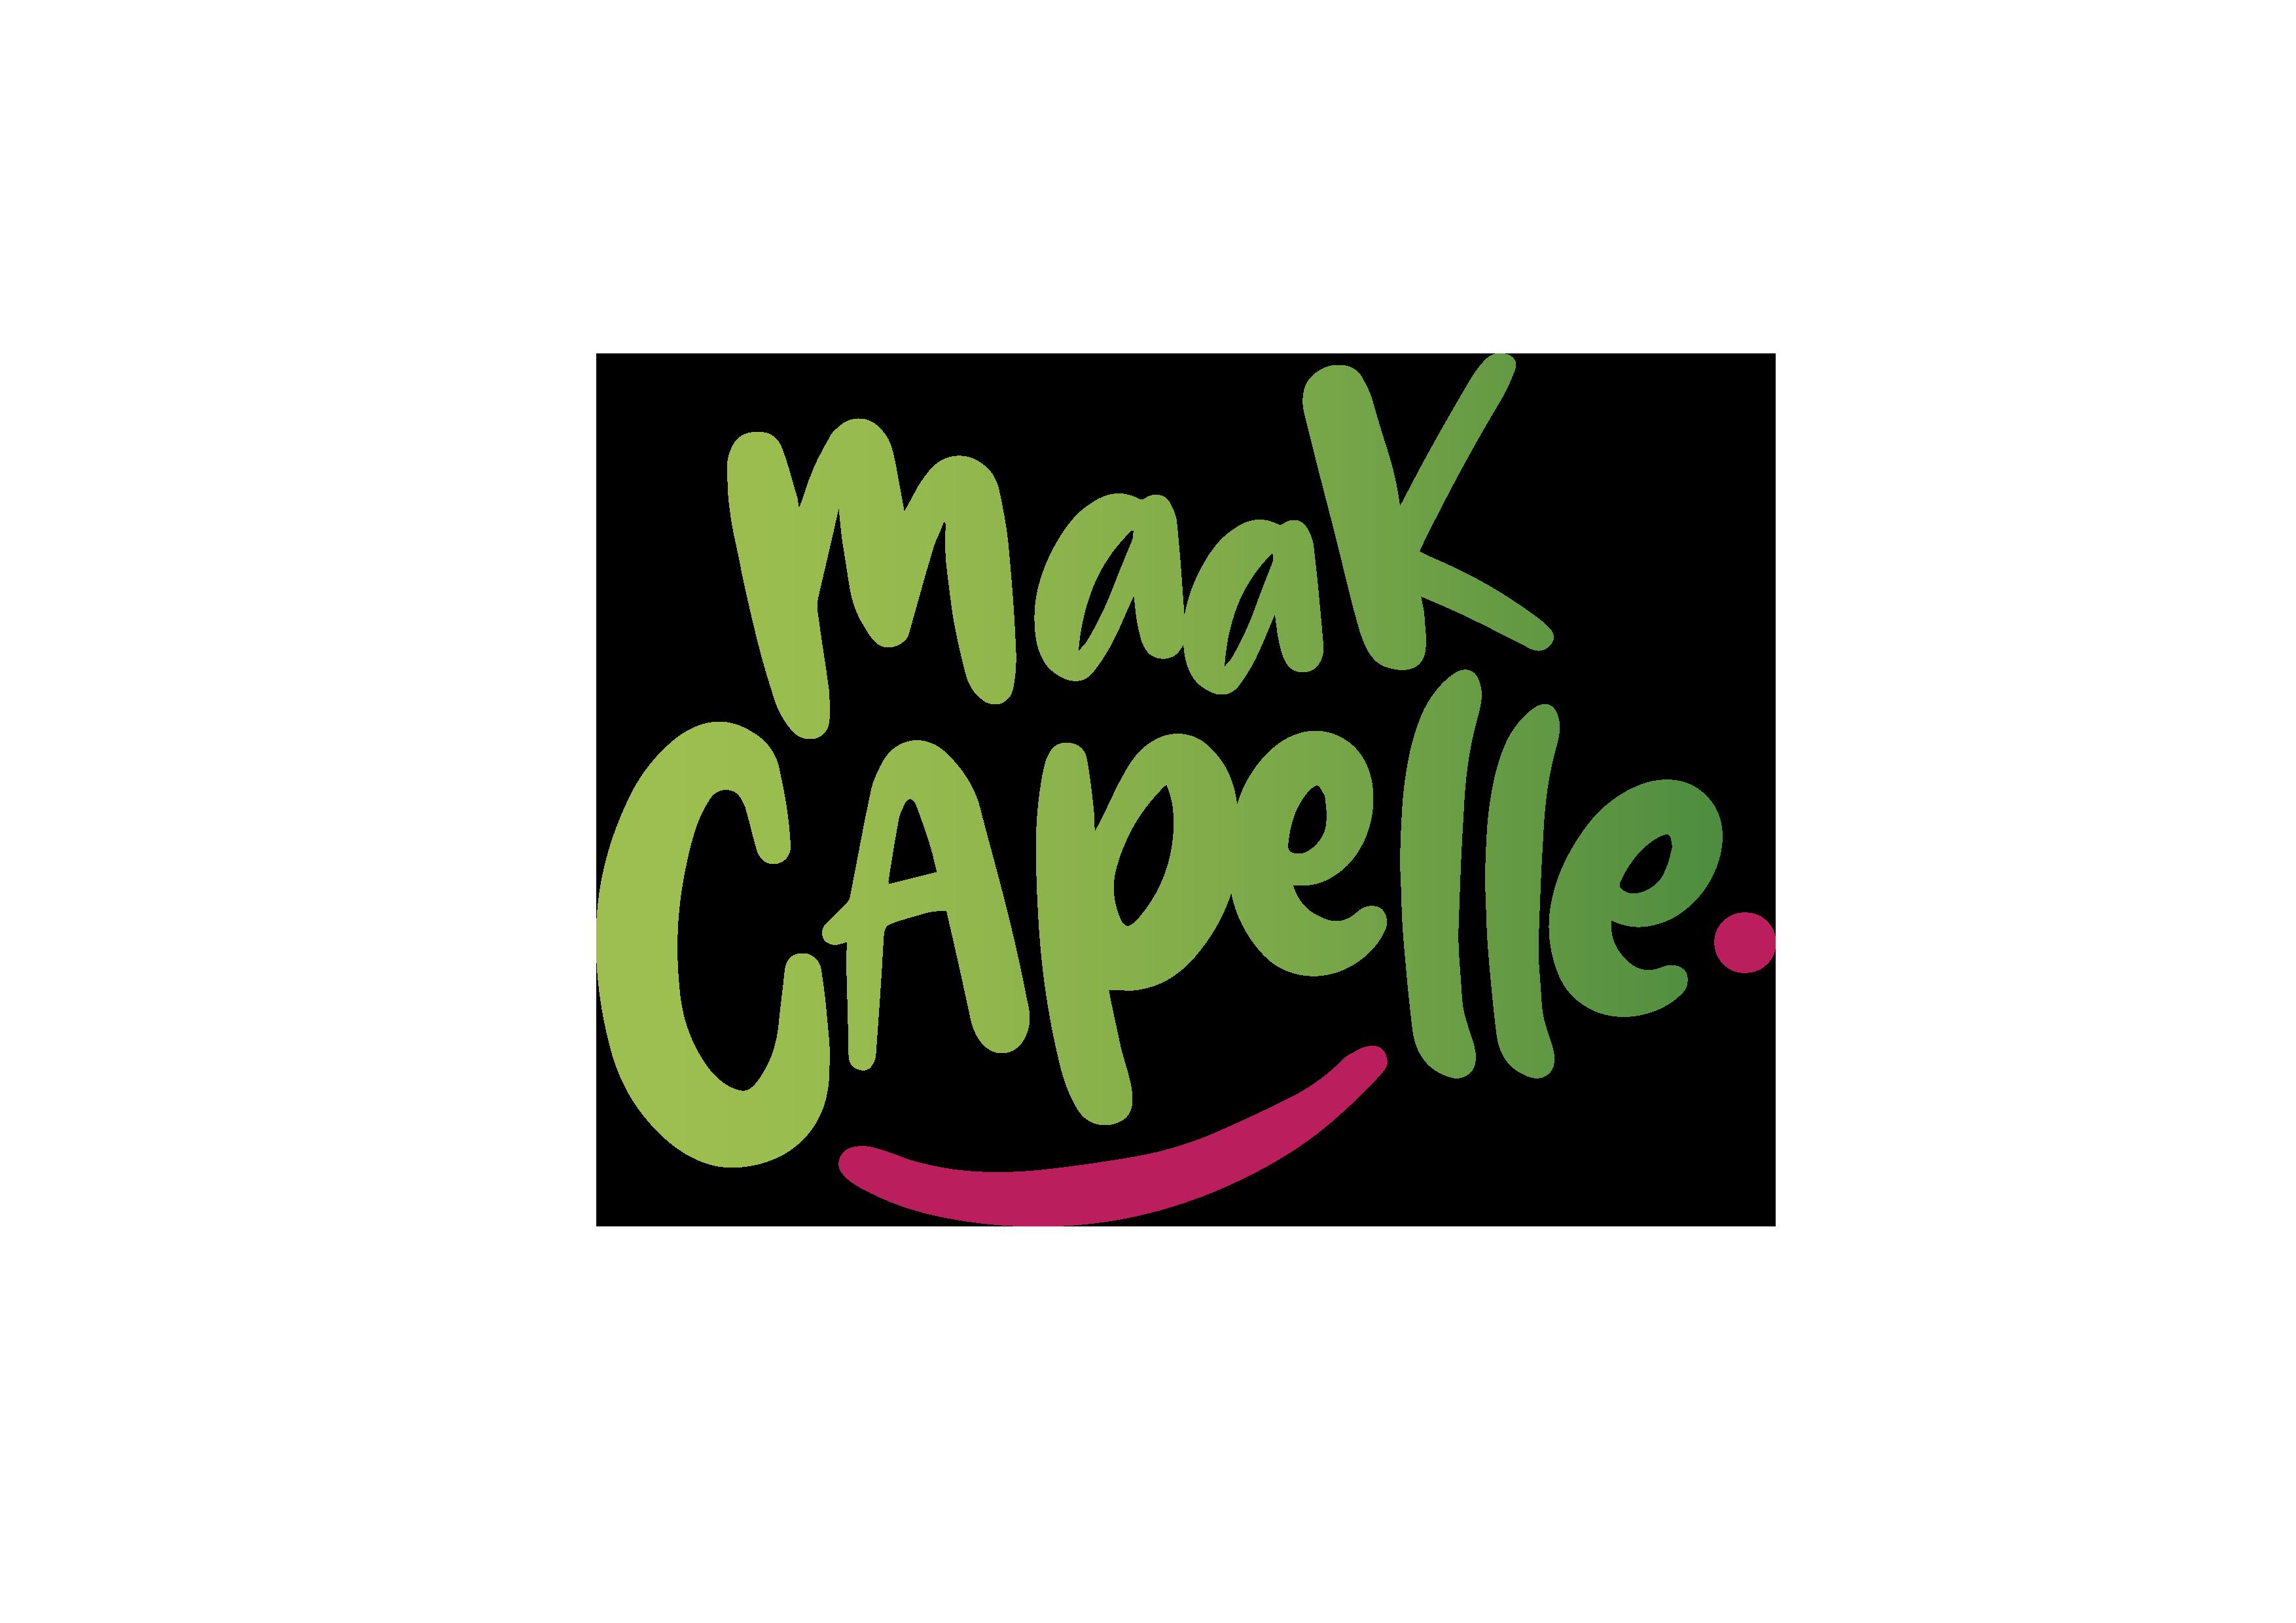 Logo Maak Capelle-Main